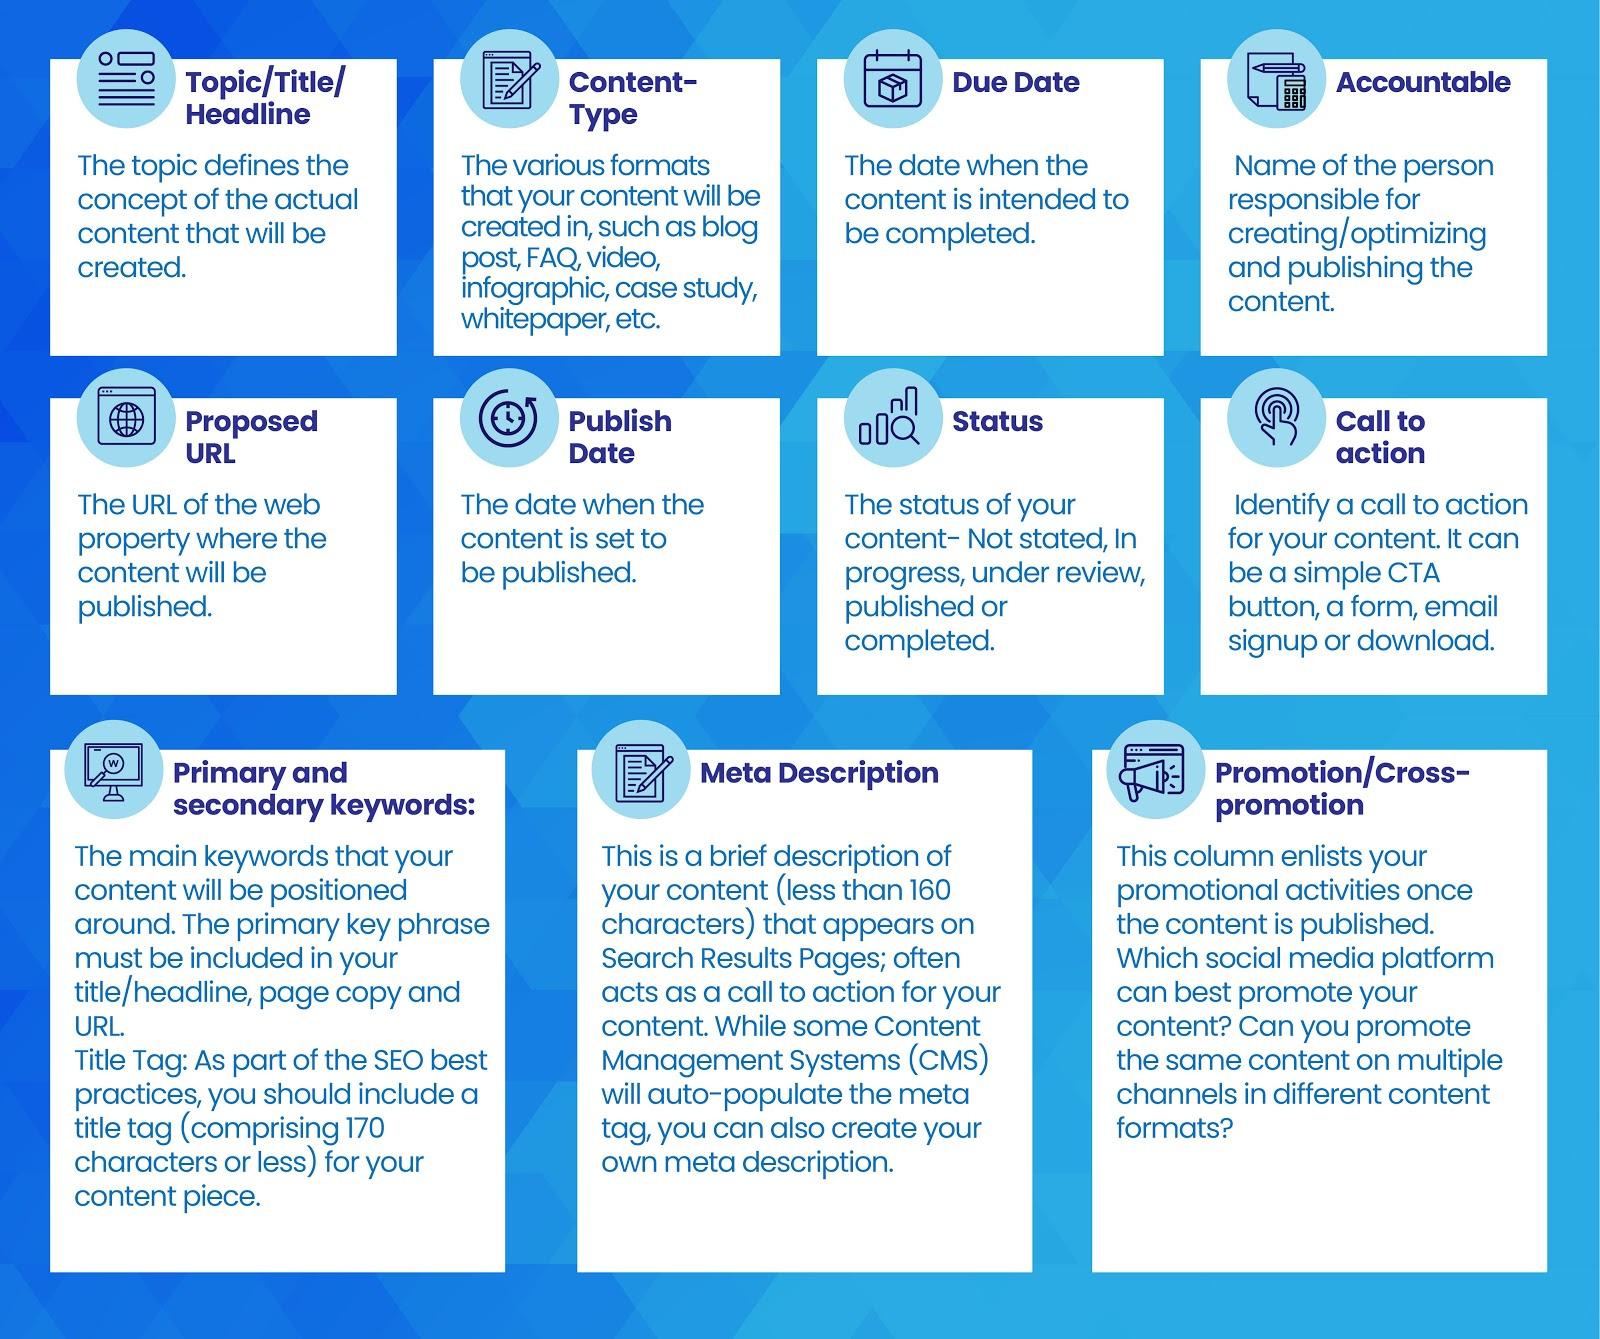 Components of a Content Marketing Calendar Template